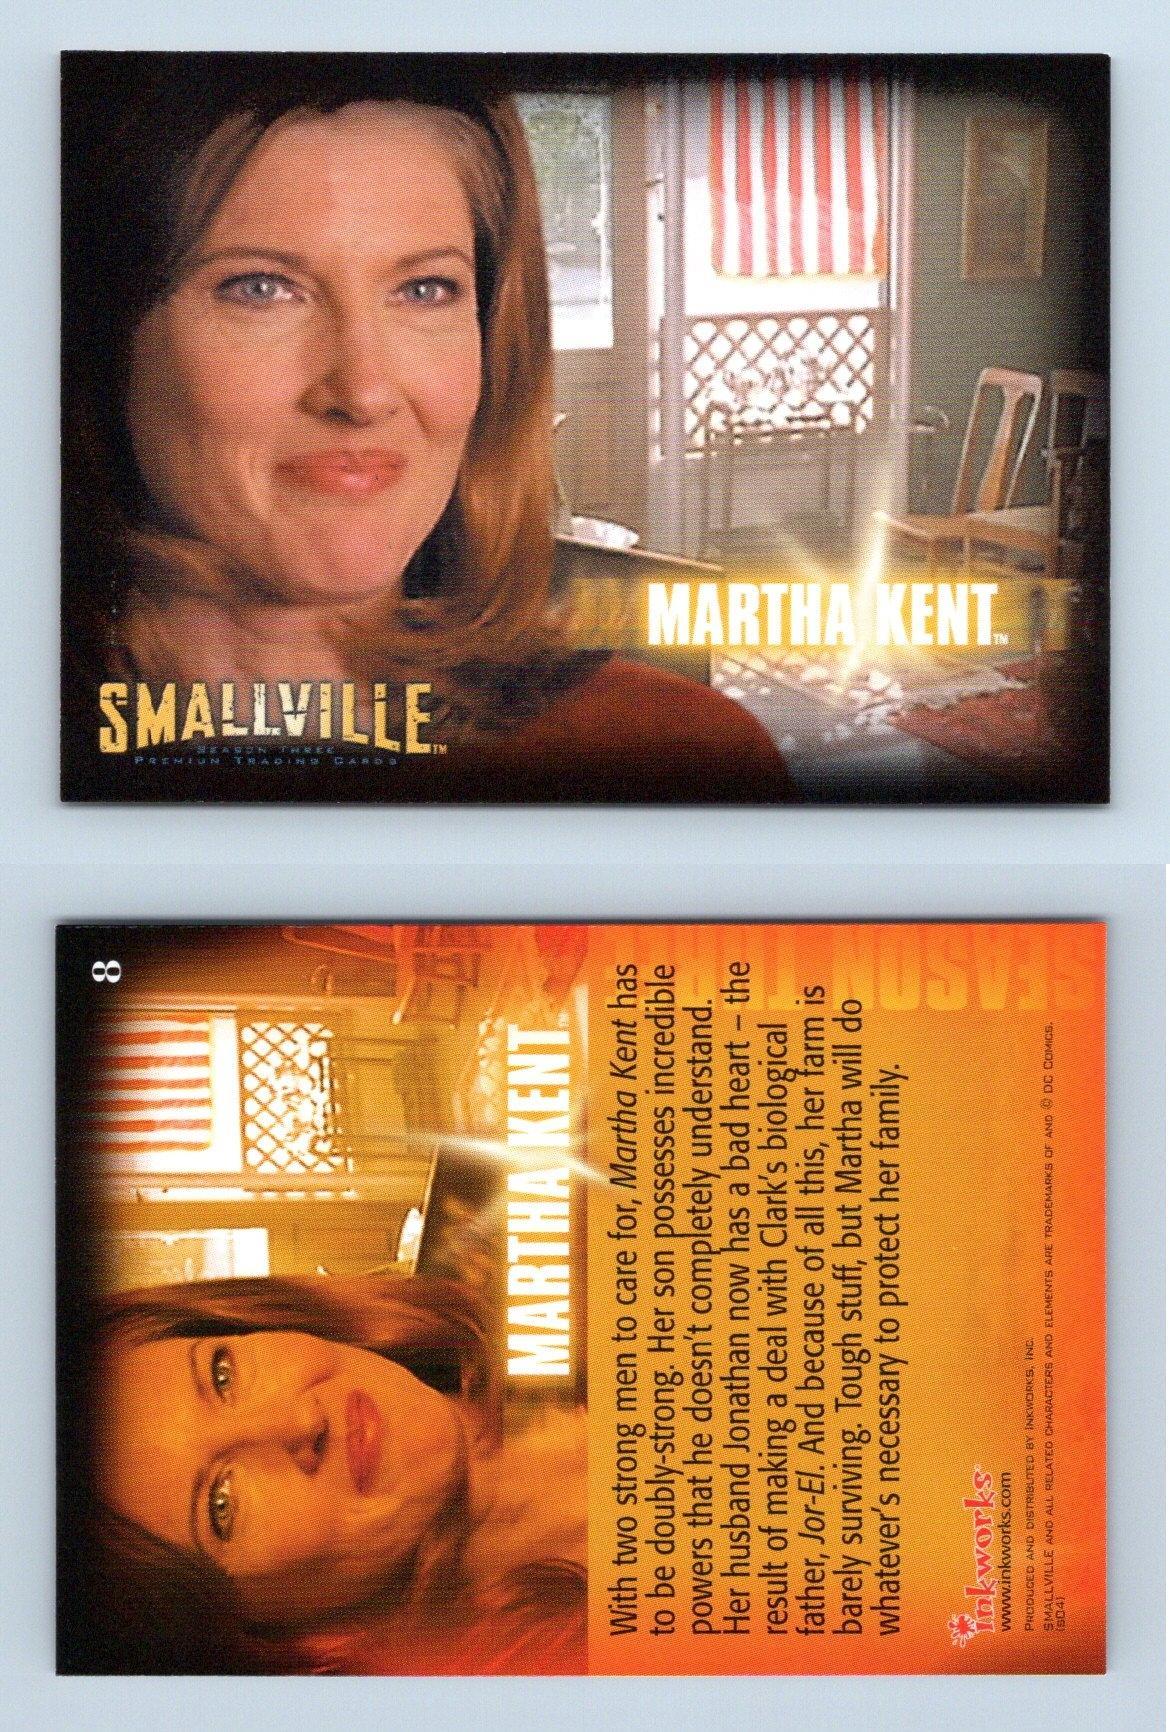 Smallville Season 3 Departures Chase Card D-6